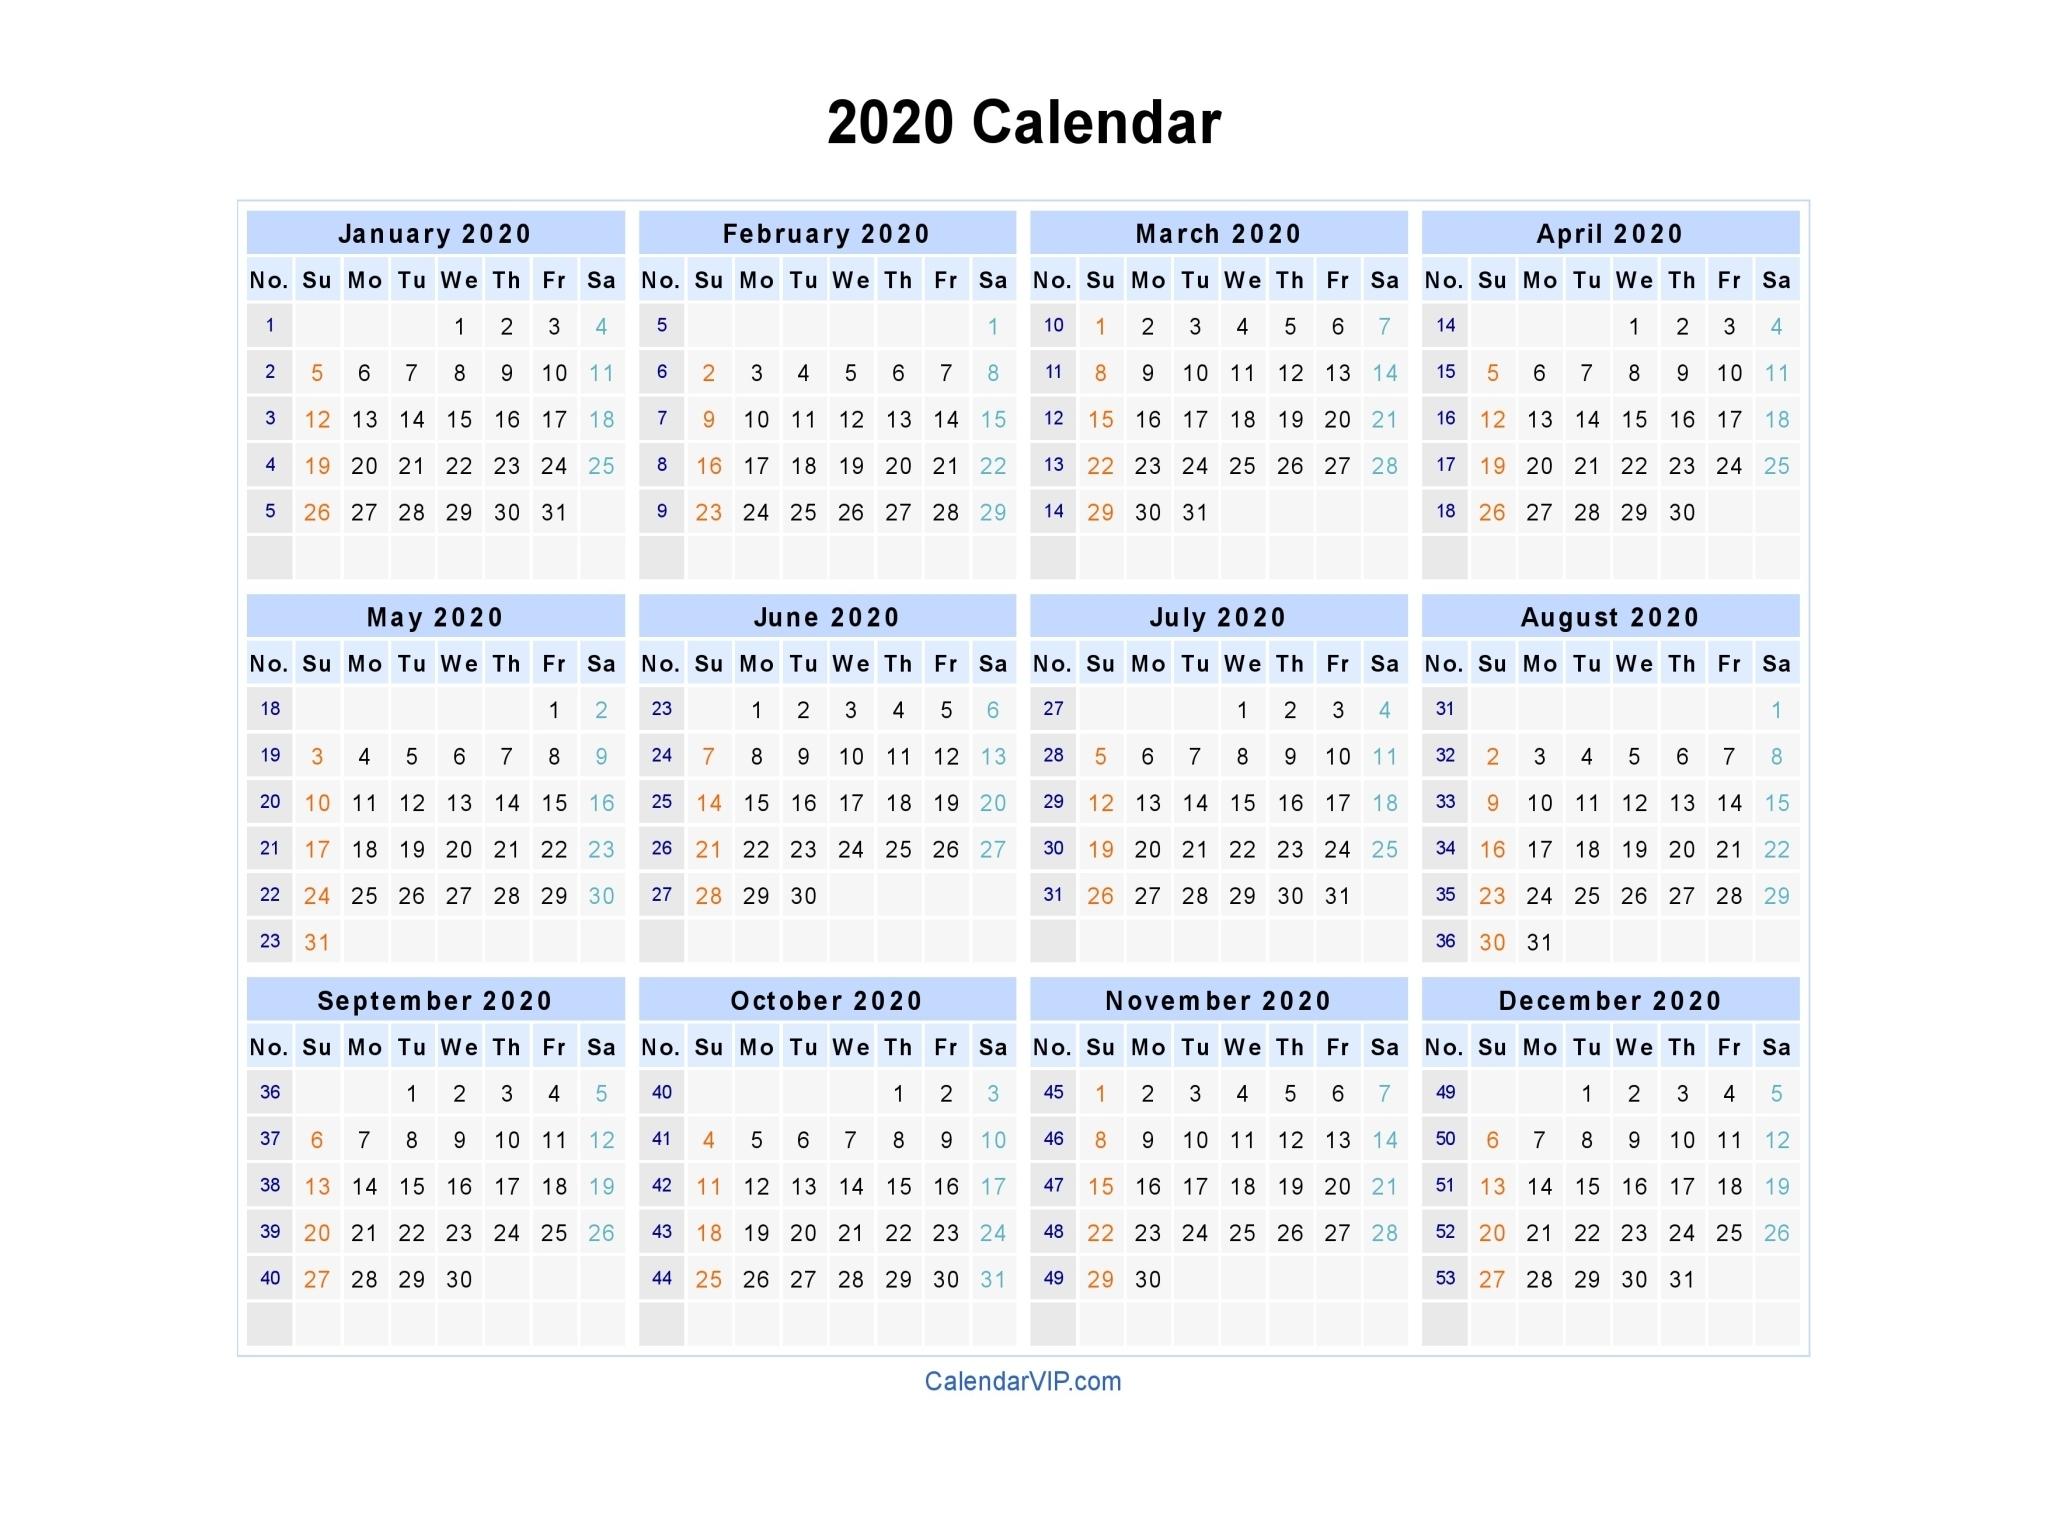 2020 Calendars To Fill In - Calendar Inspiration Design